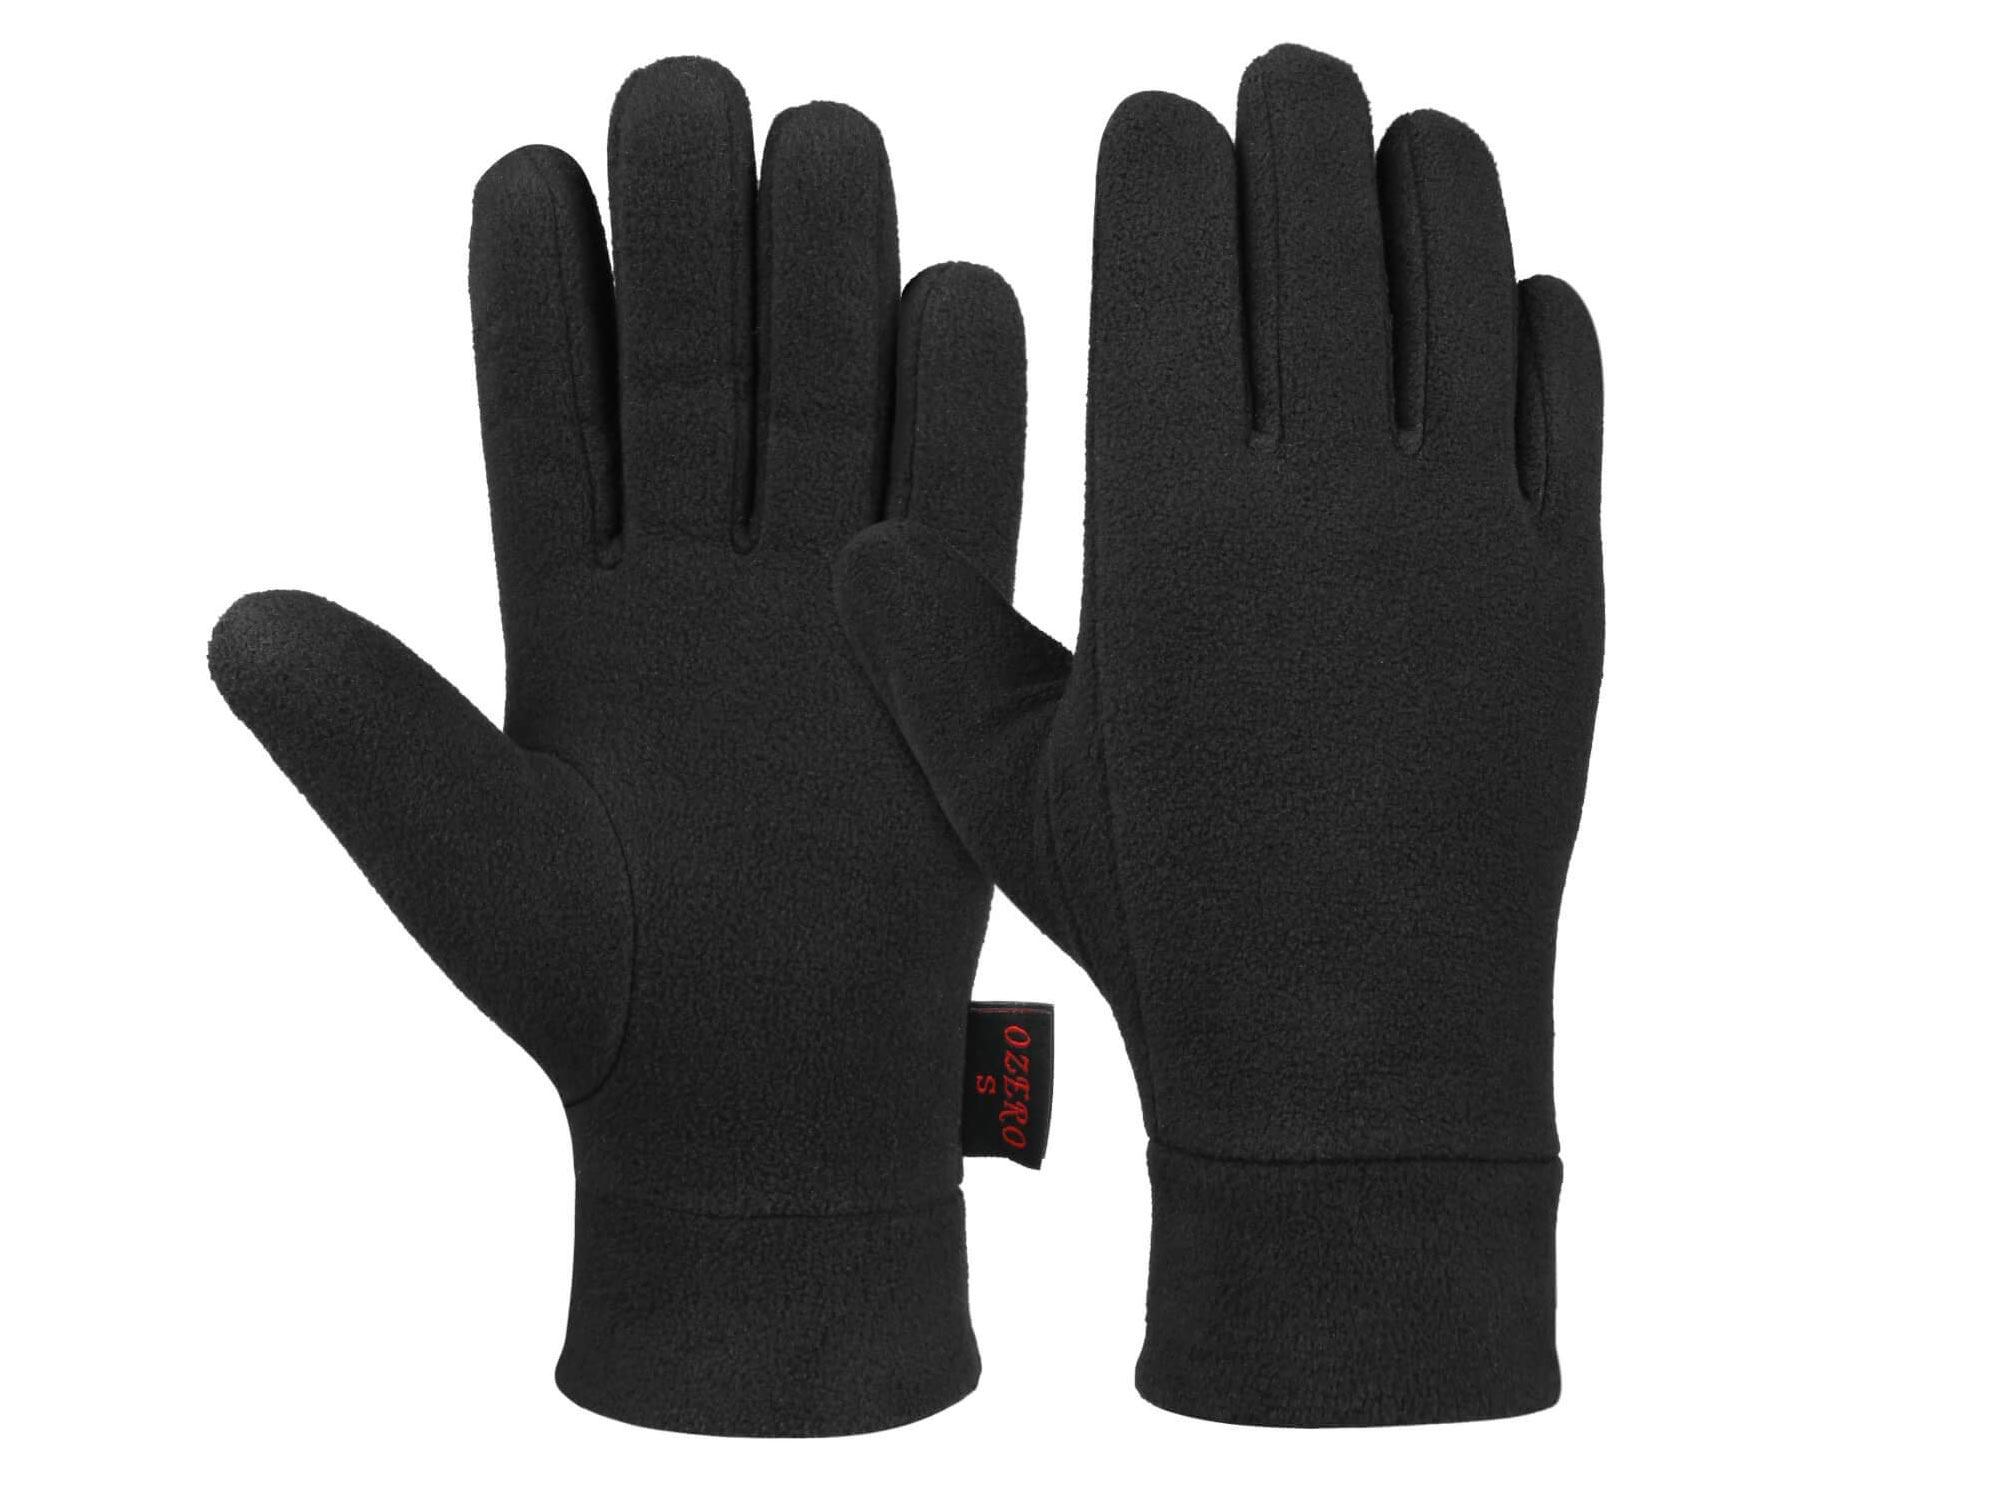 OZERO Windproof Warm Gloves